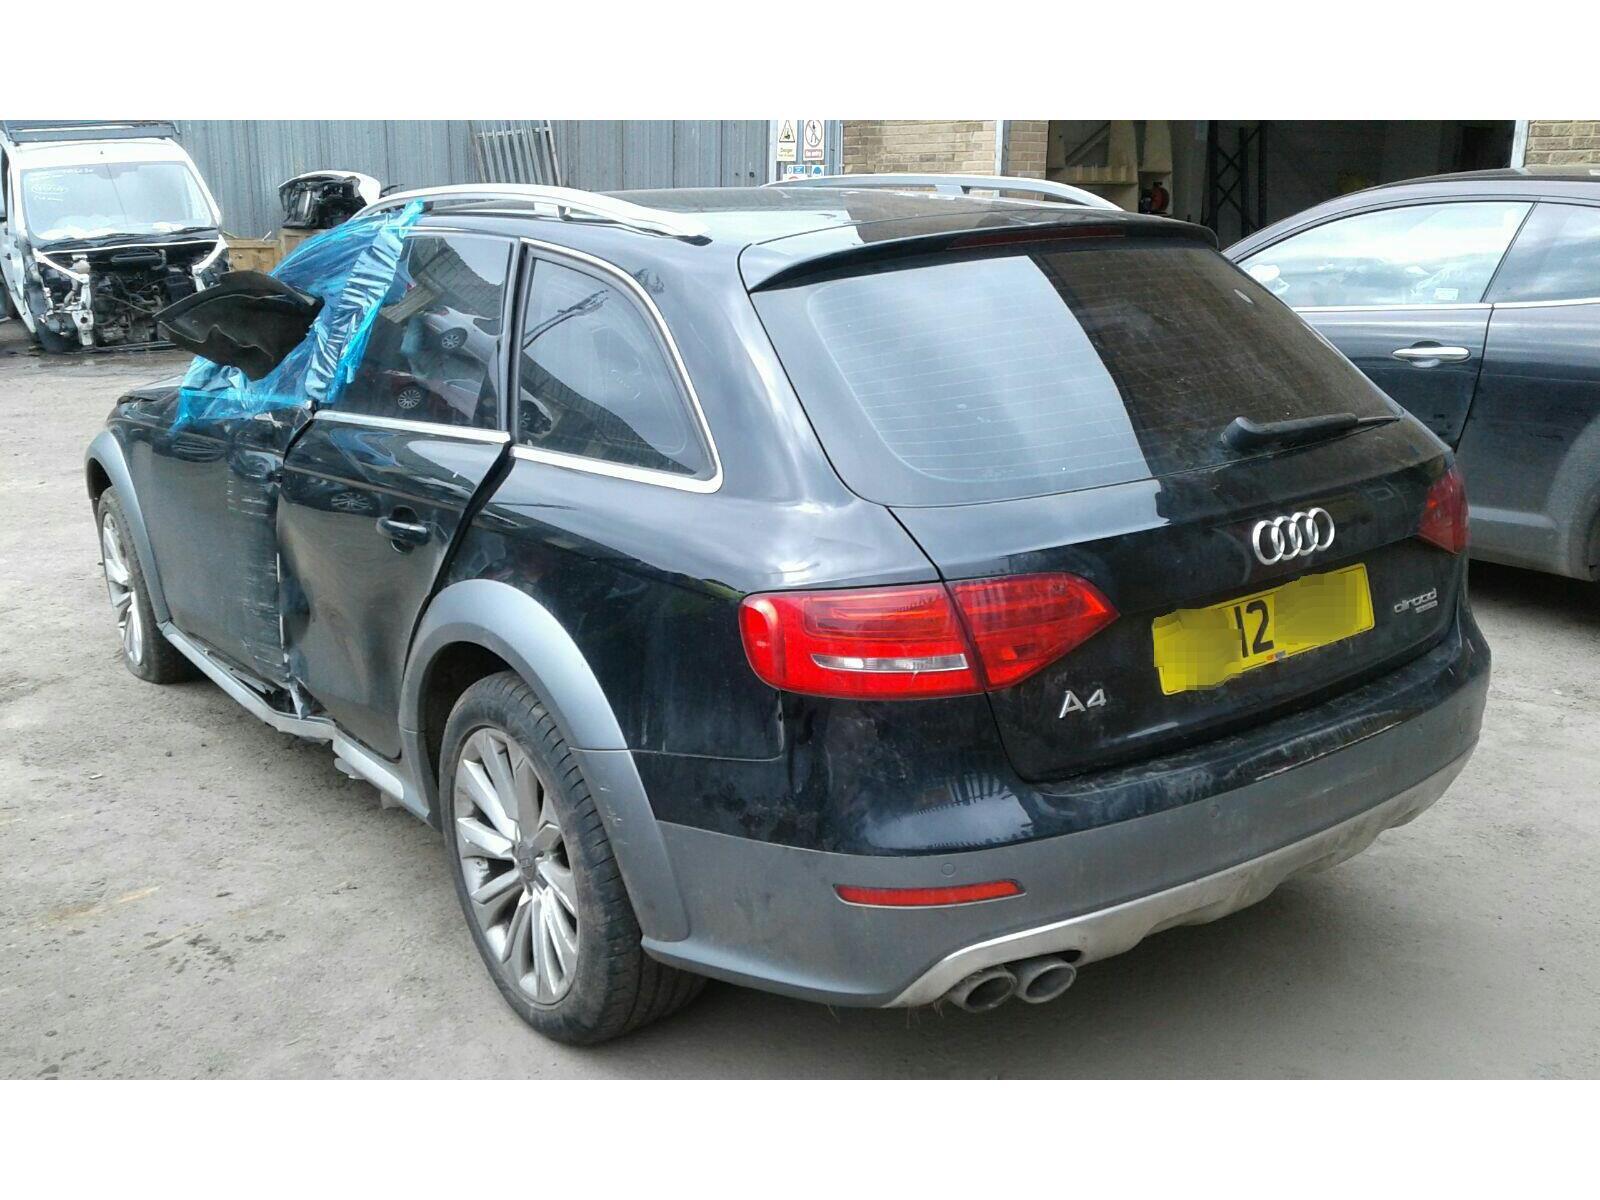 2012 Audi A4 To 2015 5 Door Estate Diesel Manual Breaking Peugeot Boxer Fuse Box Owners